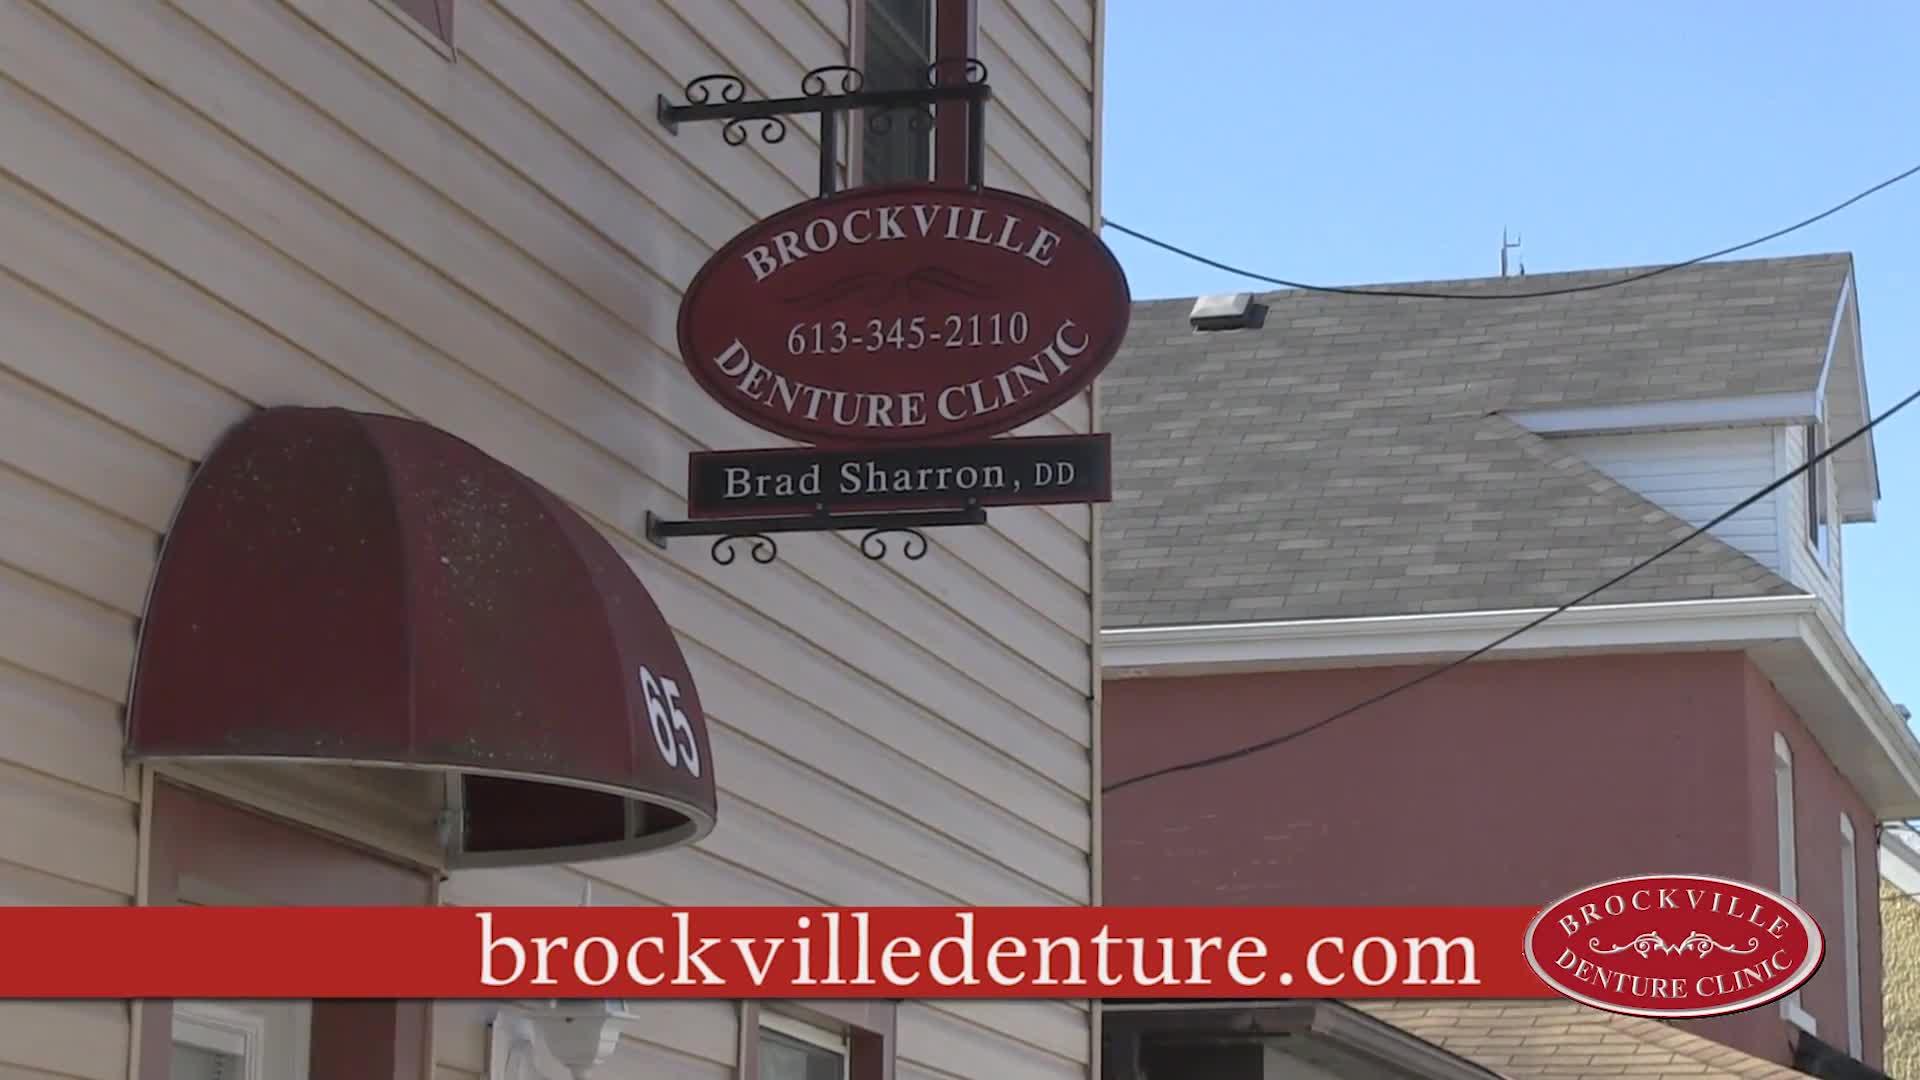 Brockville Denture Clinic - Dental Clinics & Centres - 613-345-2110